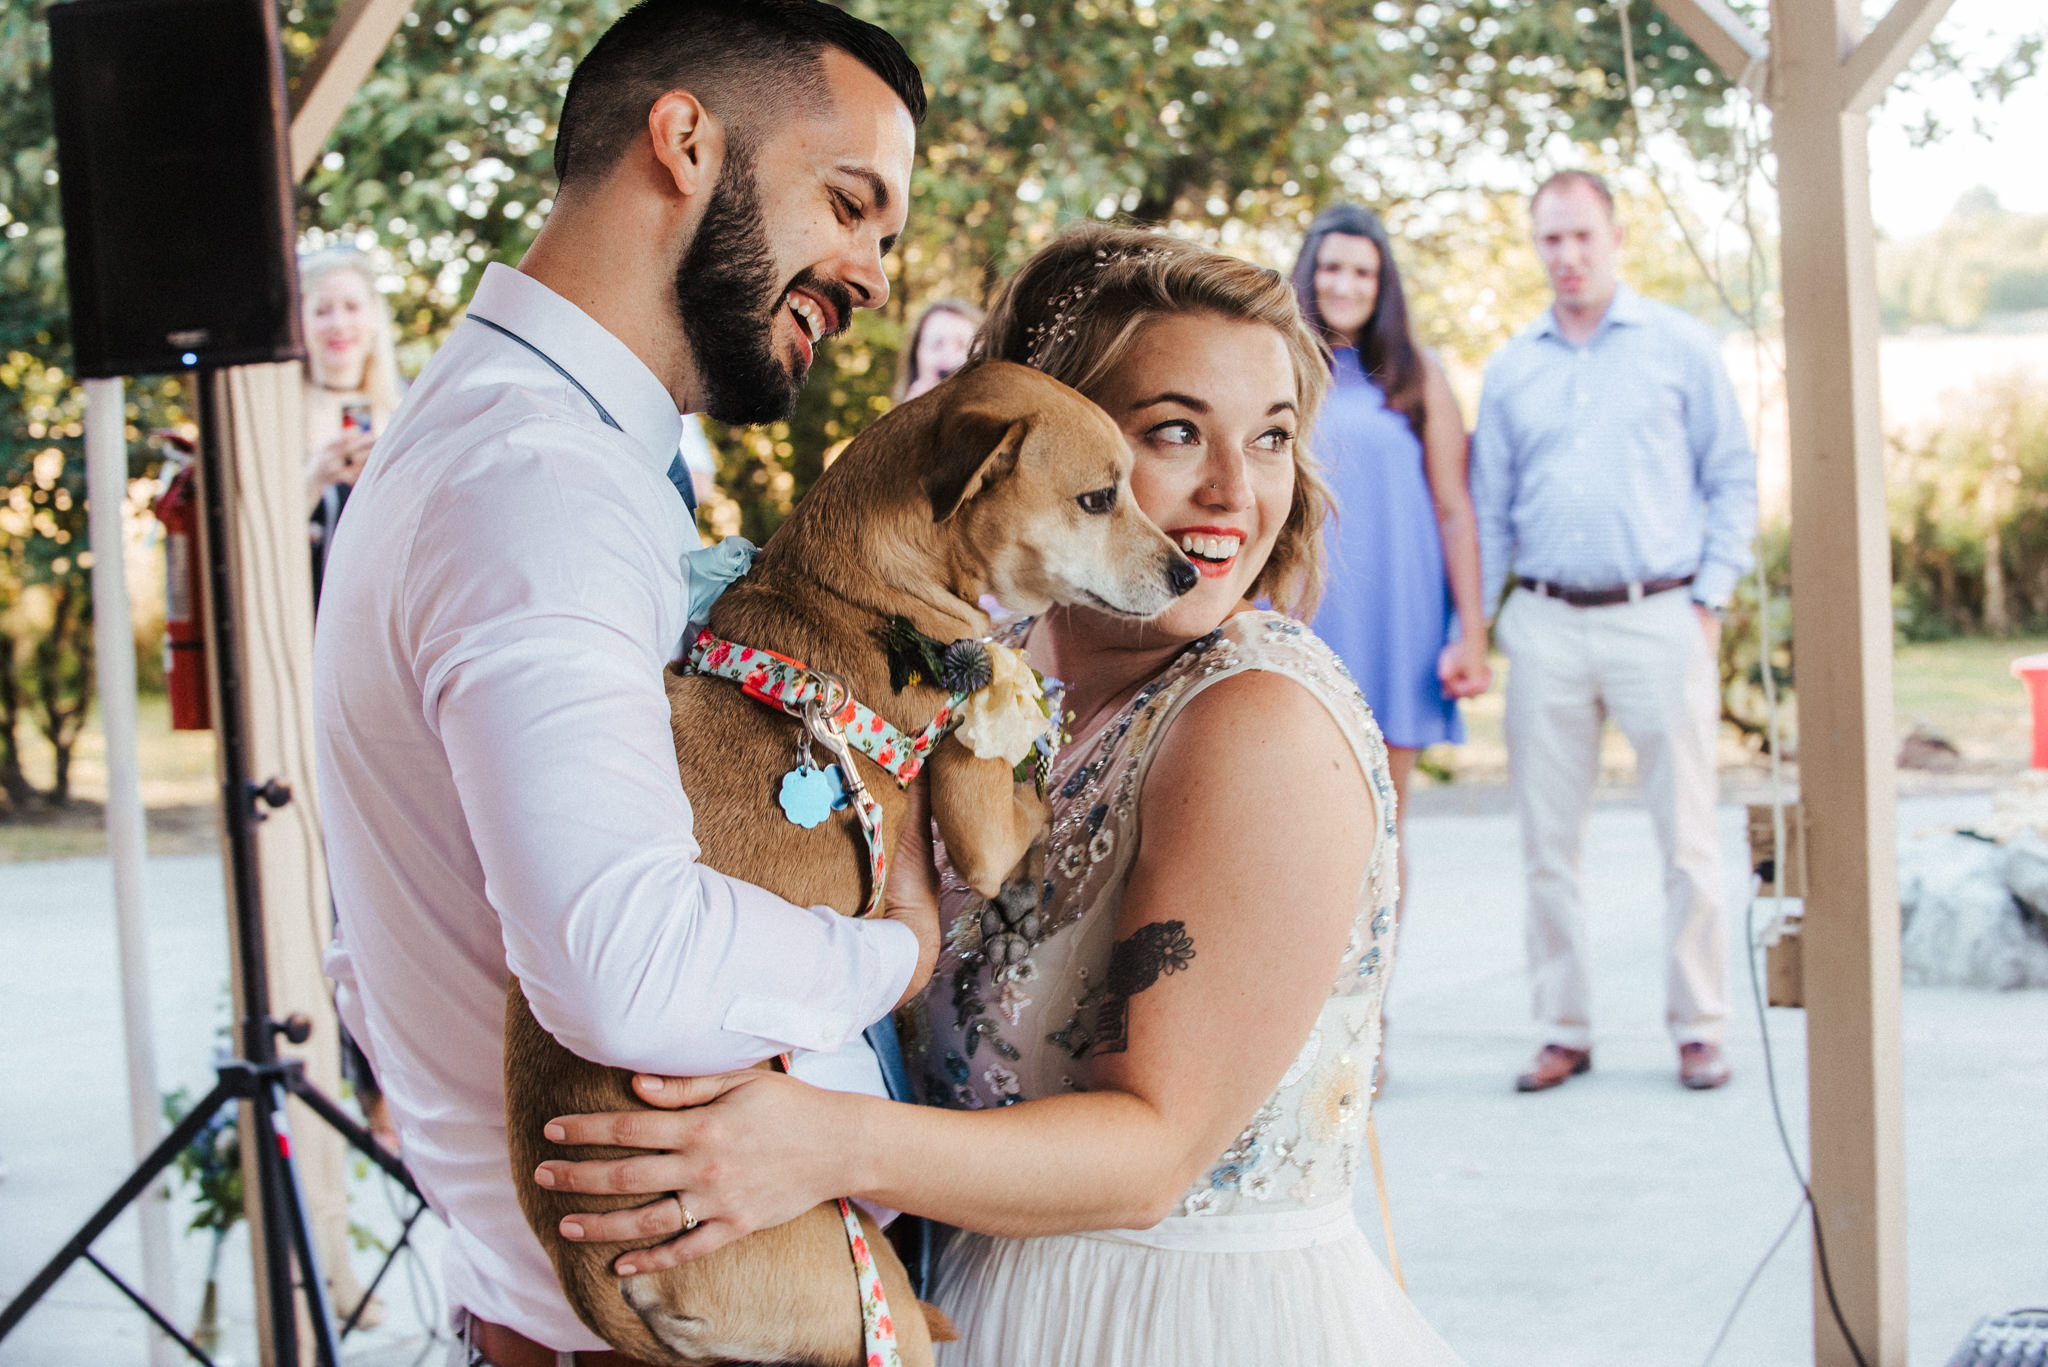 Amy Steven Seattle Wedding Photographer Vishal Goklani_052.jpg